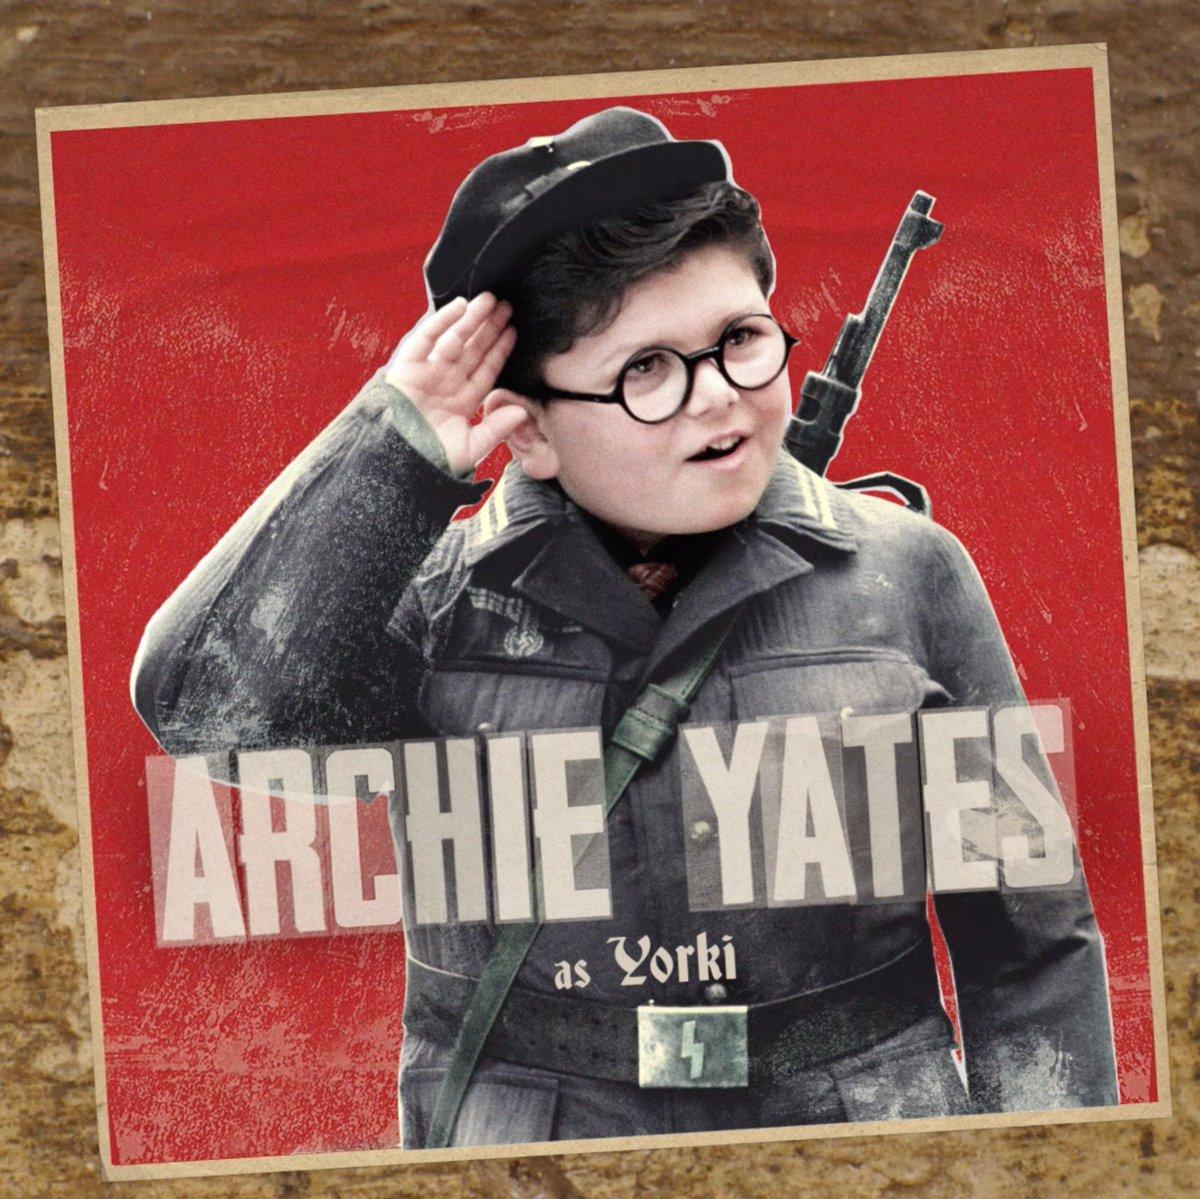 Archie Yates